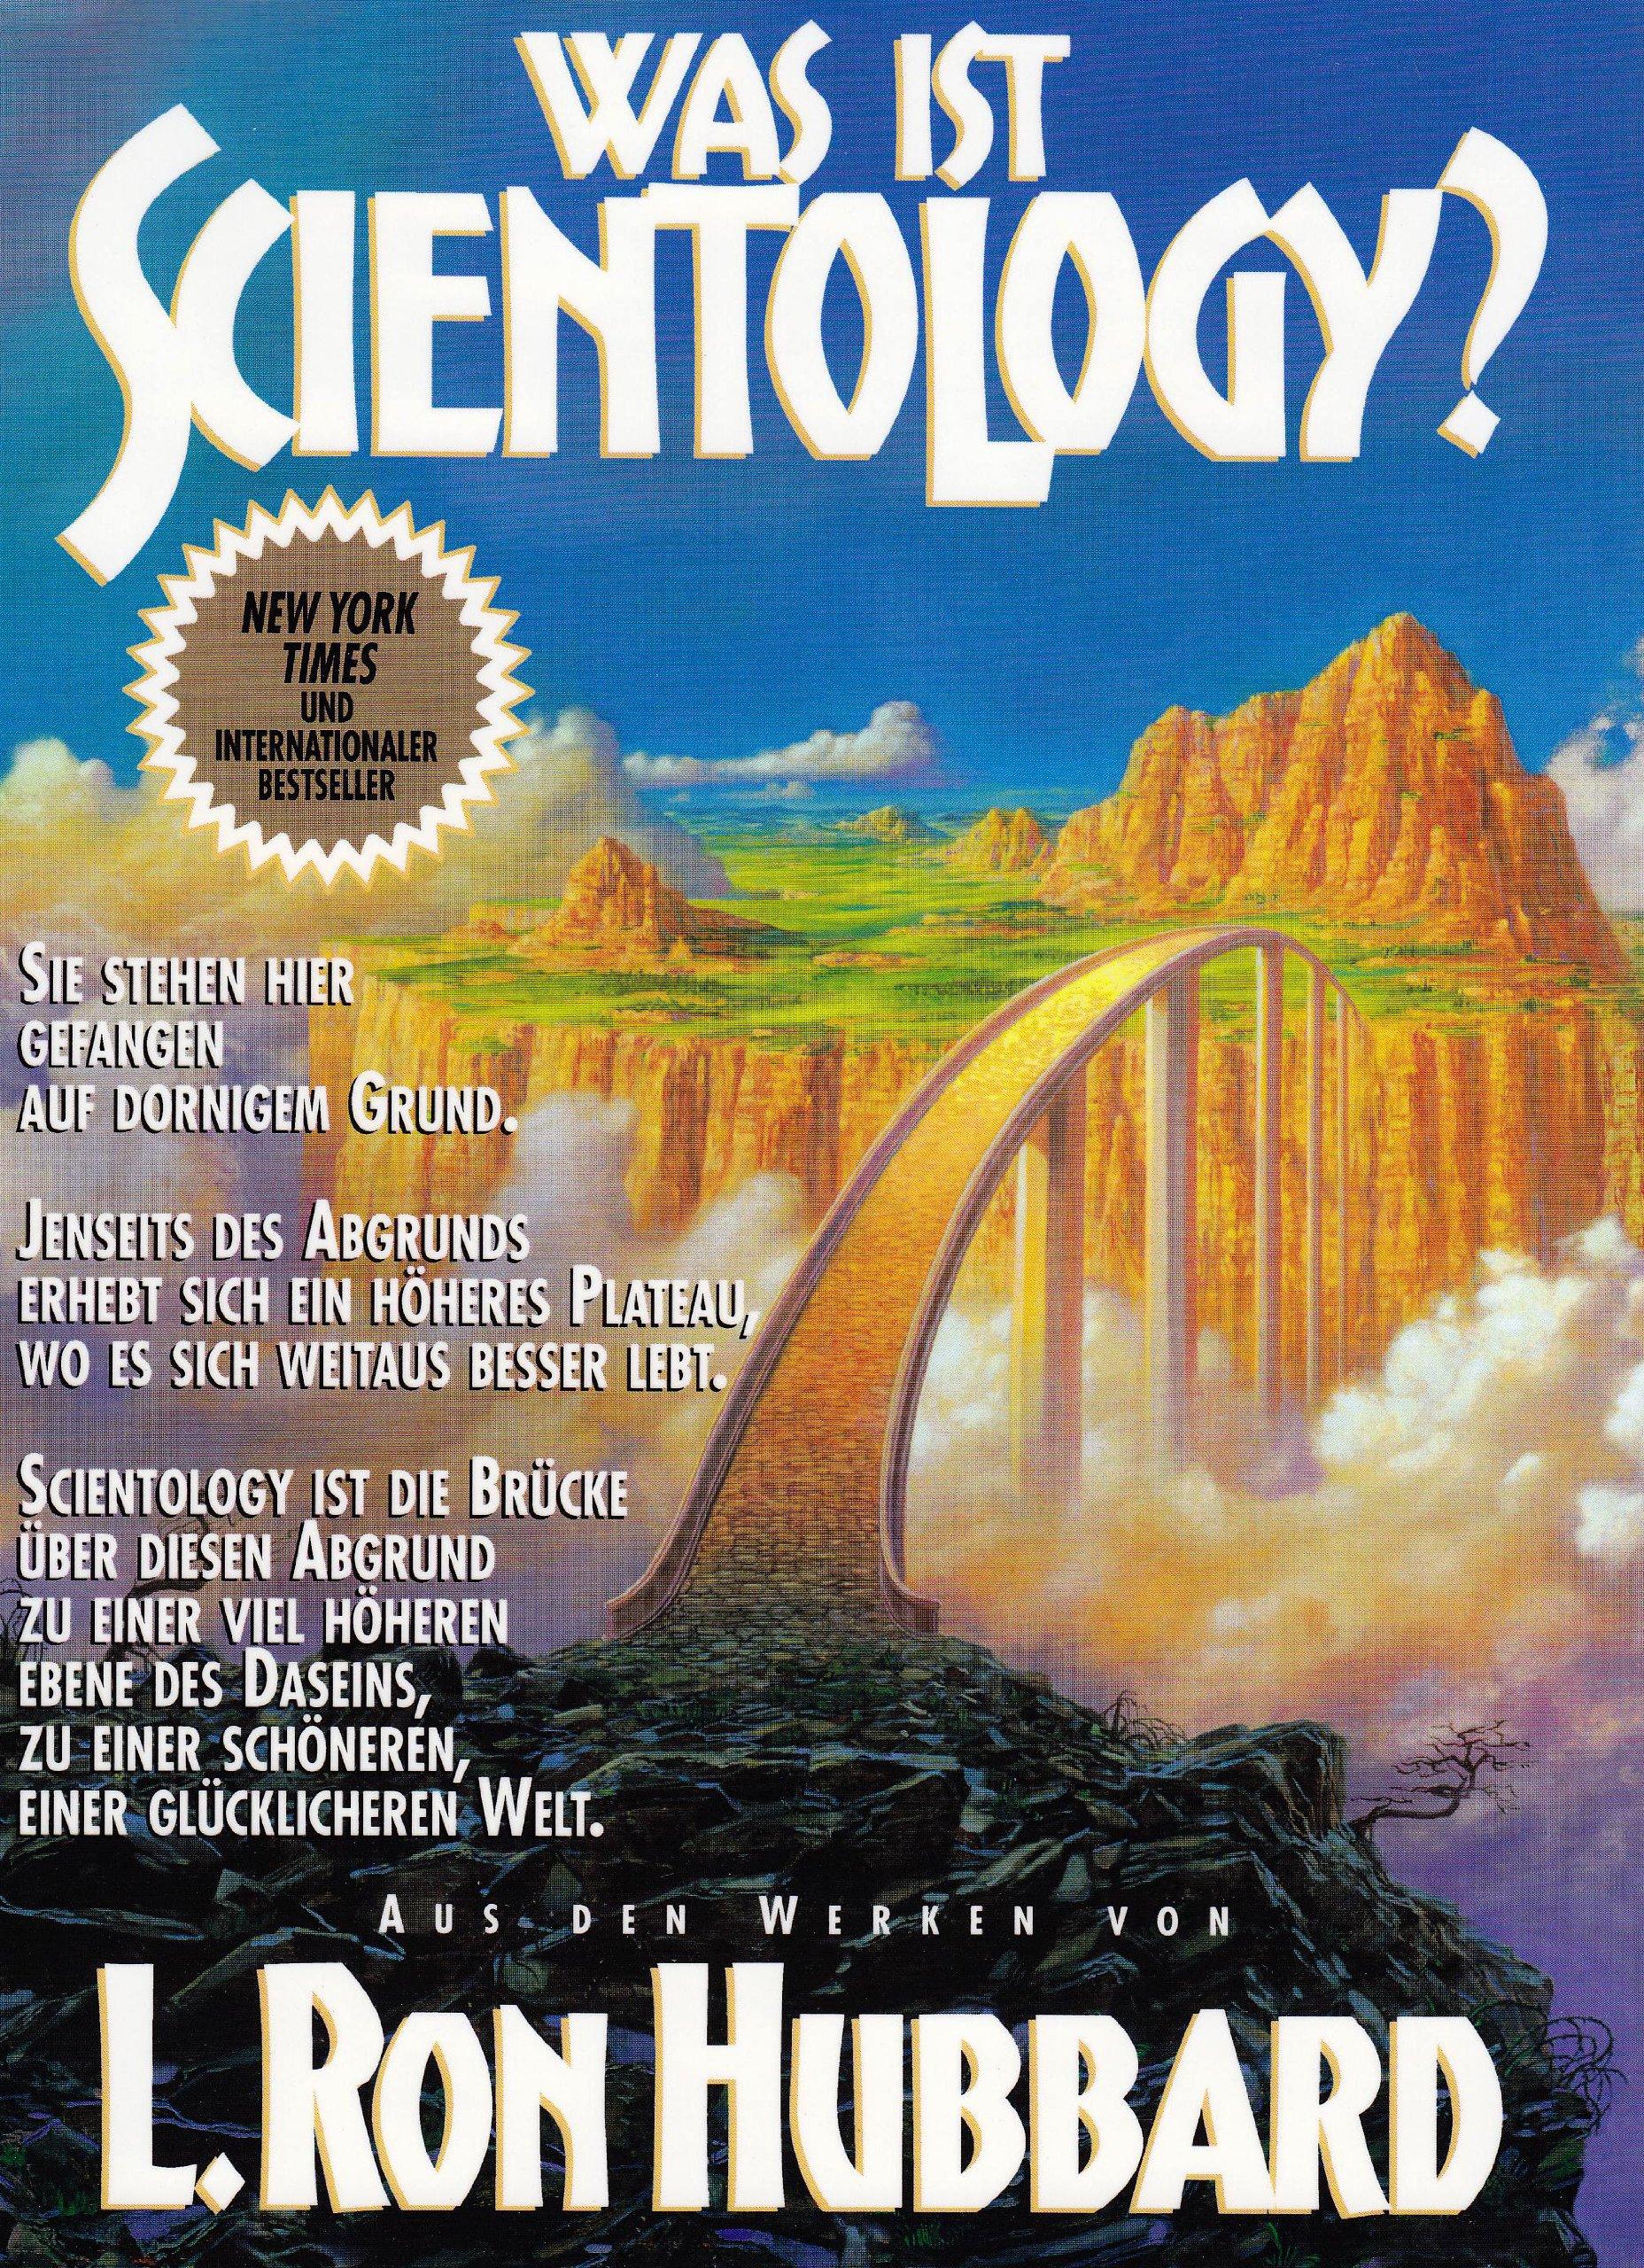 german german edition l ron hubbard 9788778166104 amazoncom books - L Ron Hubbard Lebenslauf